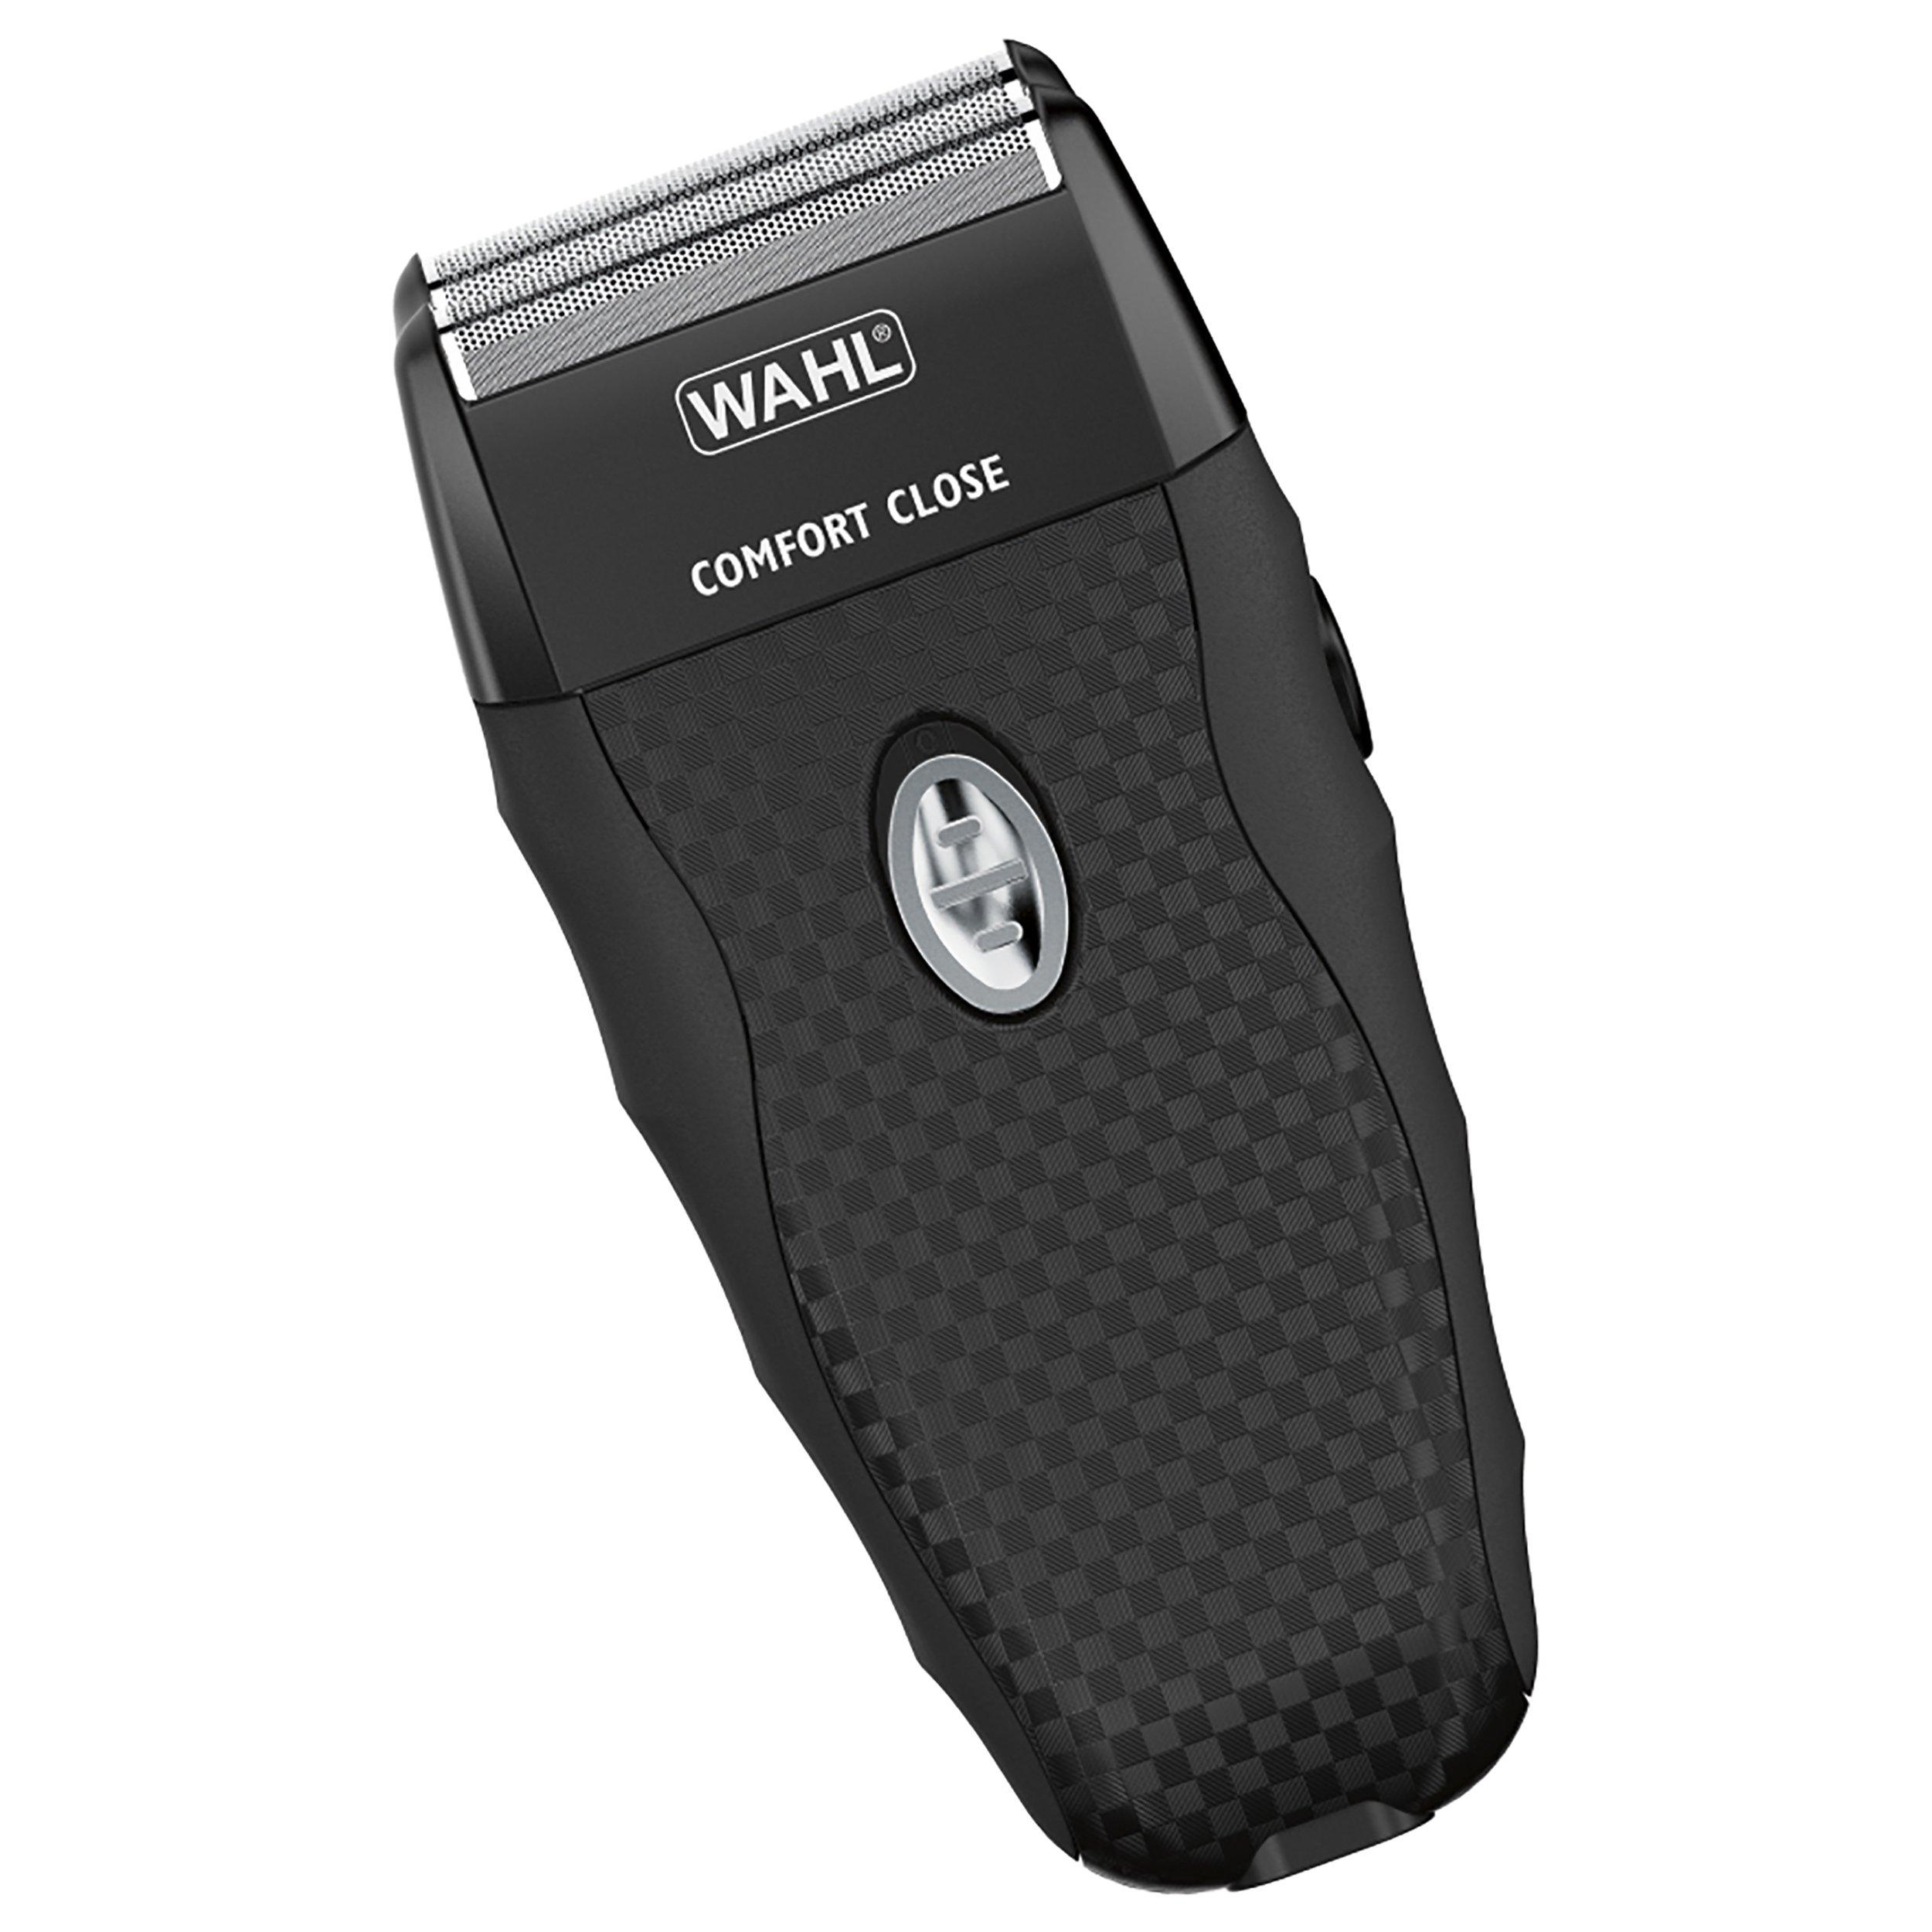 Wahl Flex Shave Rechargeable Foil Shaver #7367-400 by Wahl